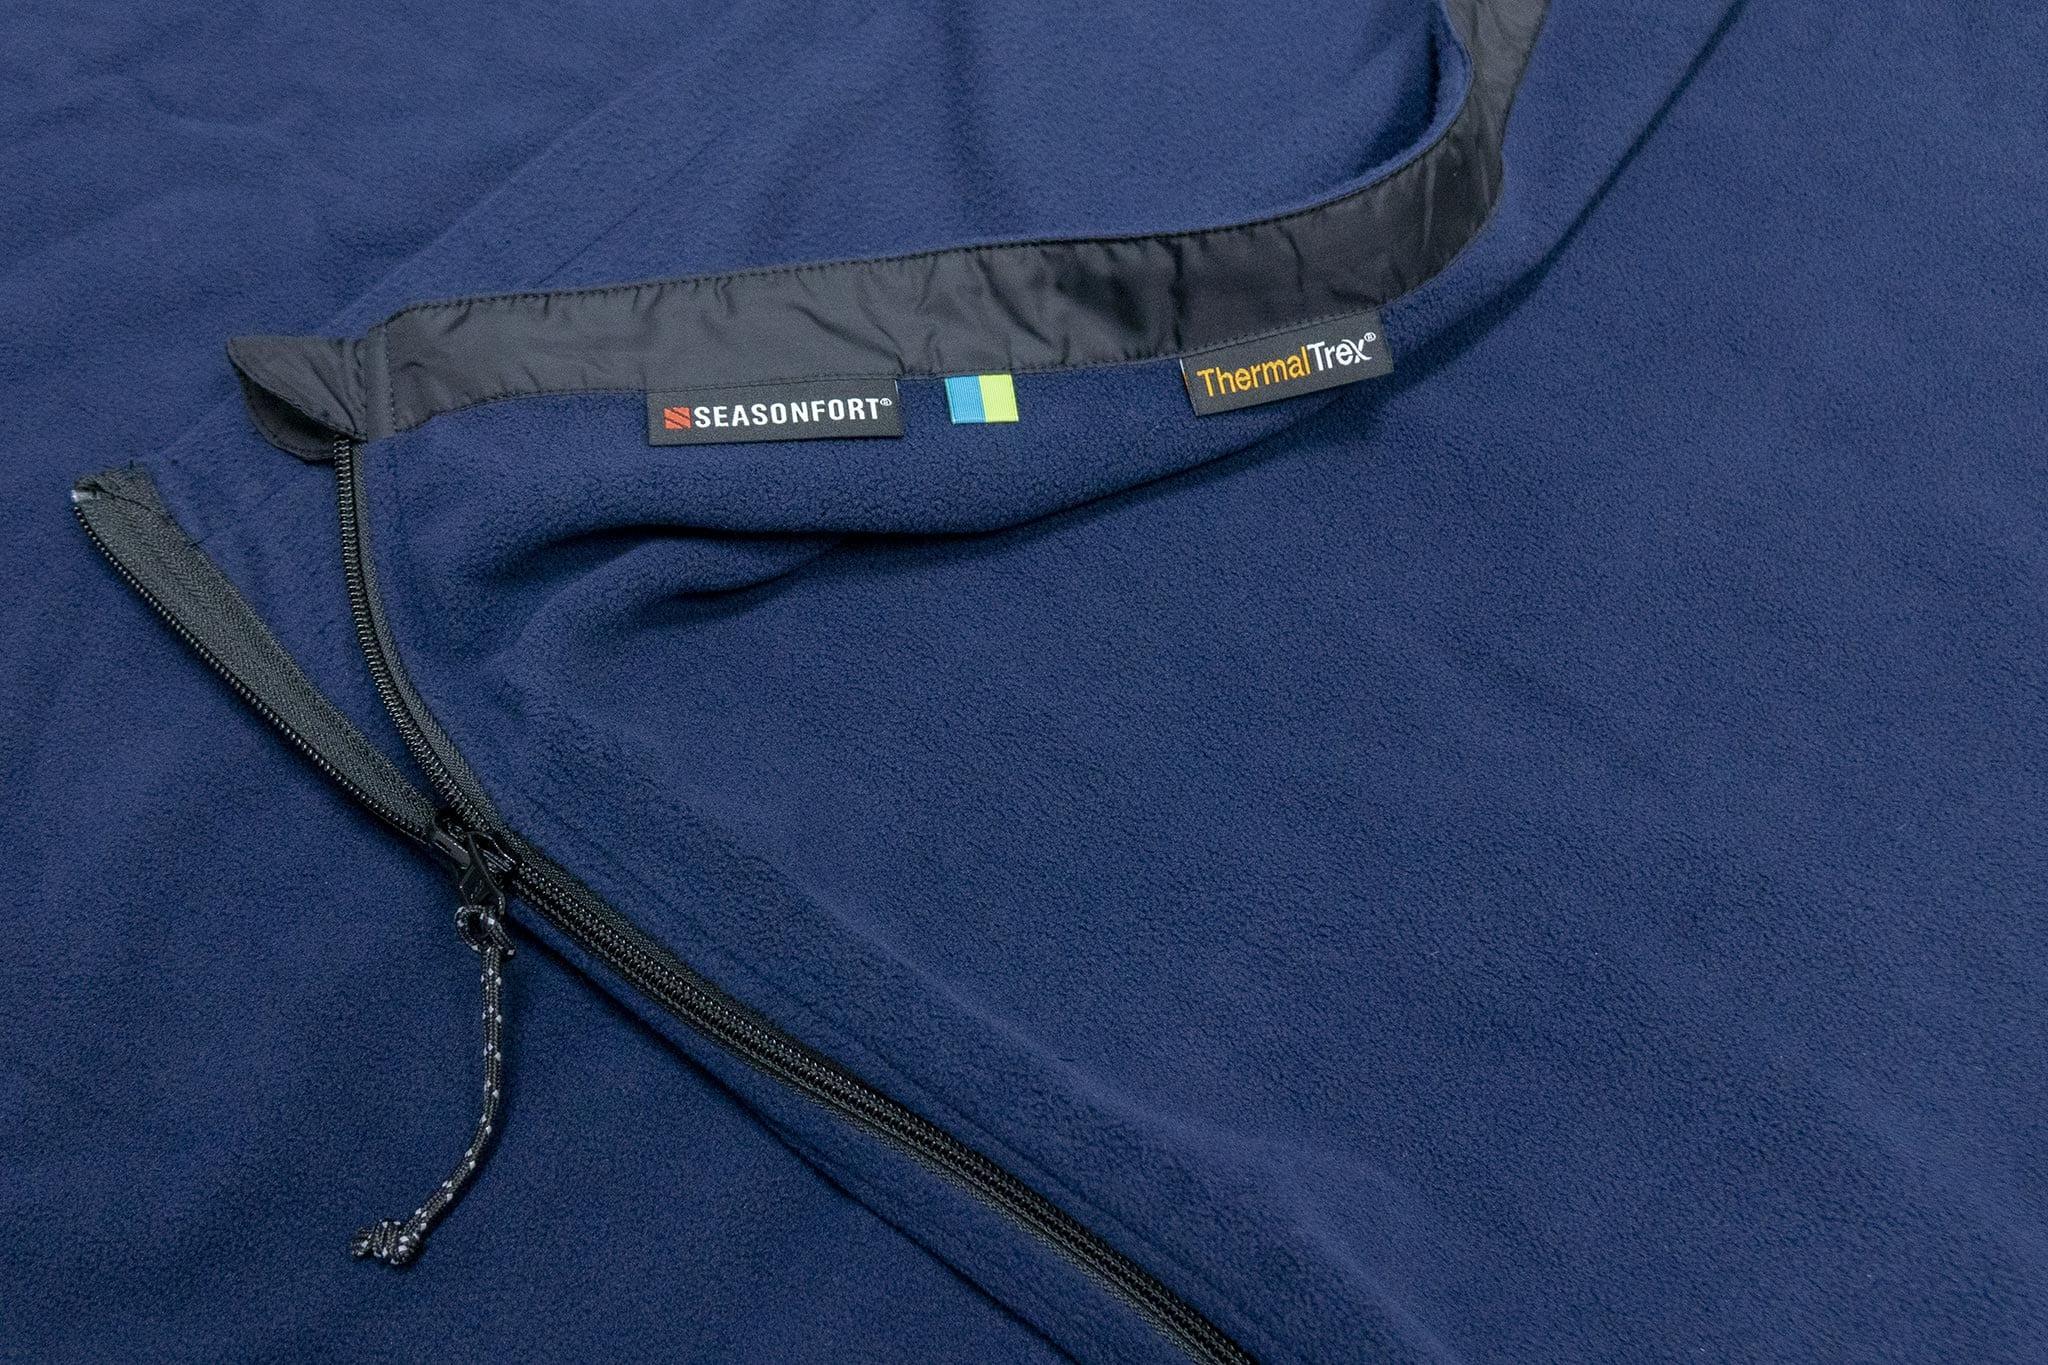 SEASONFORT Fire Retardant Sleeping Bag